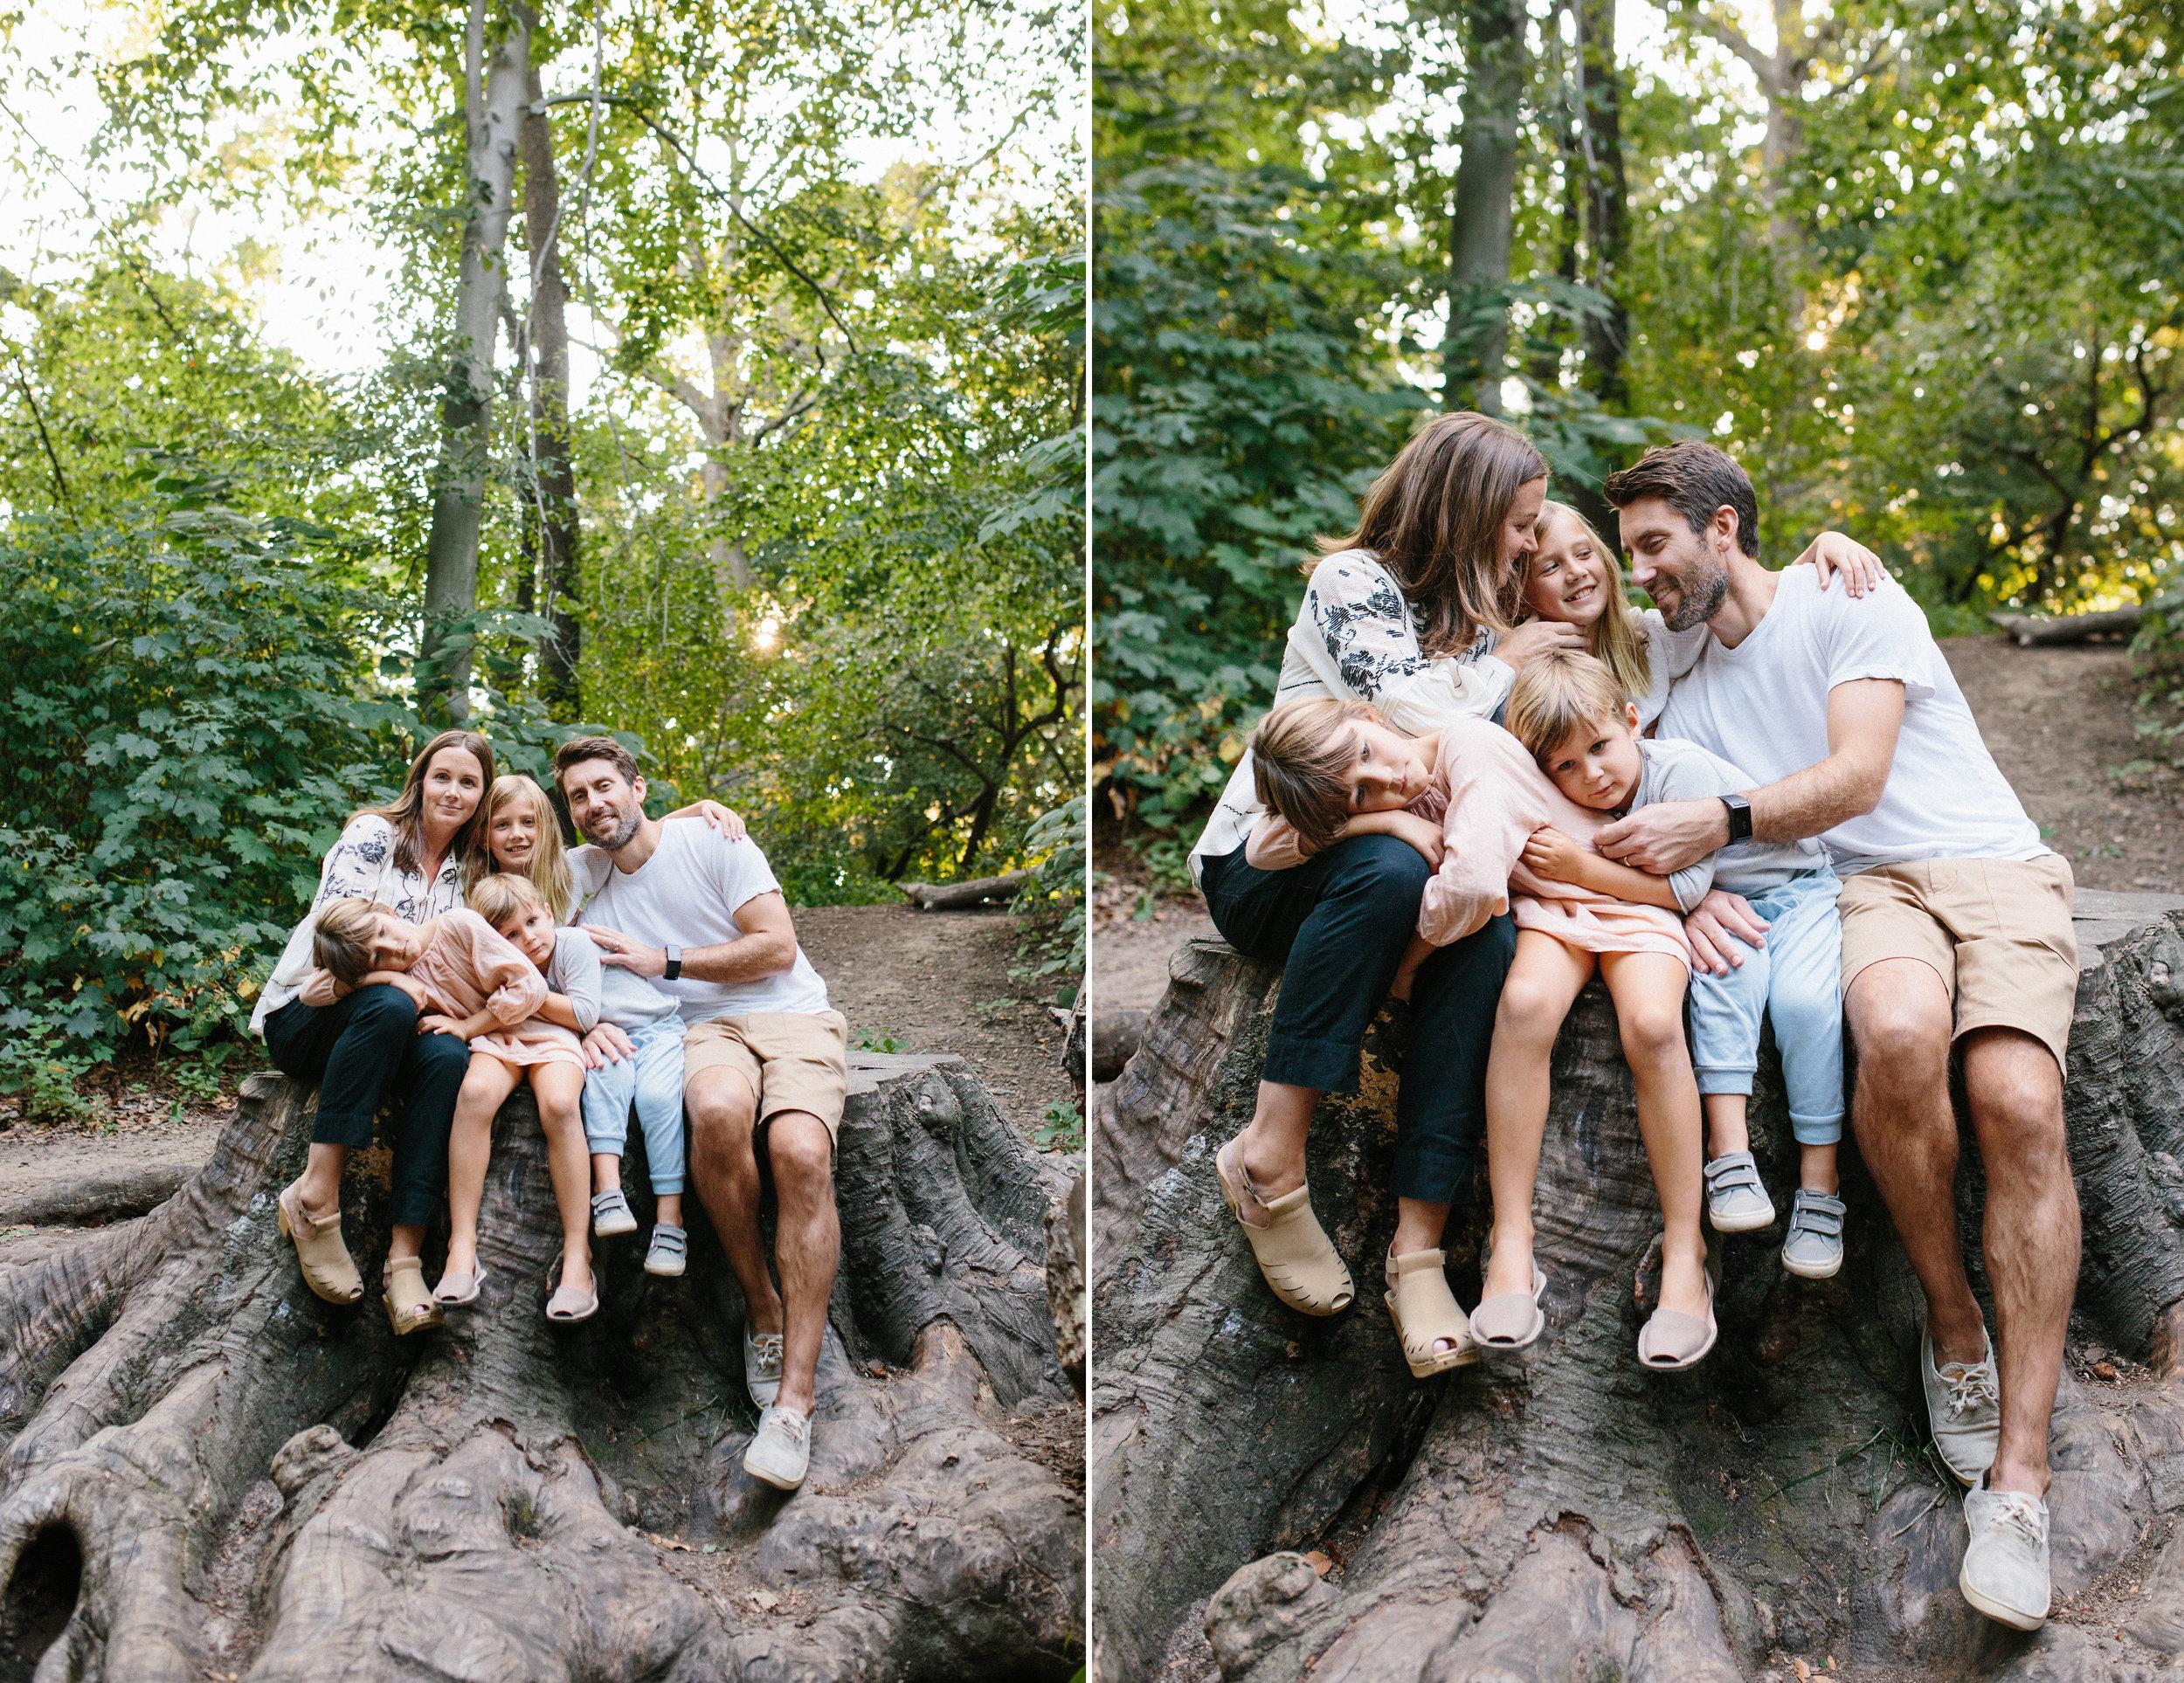 park-slope-brooklyn-family-photography_in-home-session_nicki-sebastian-photography_new-york-16.jpg